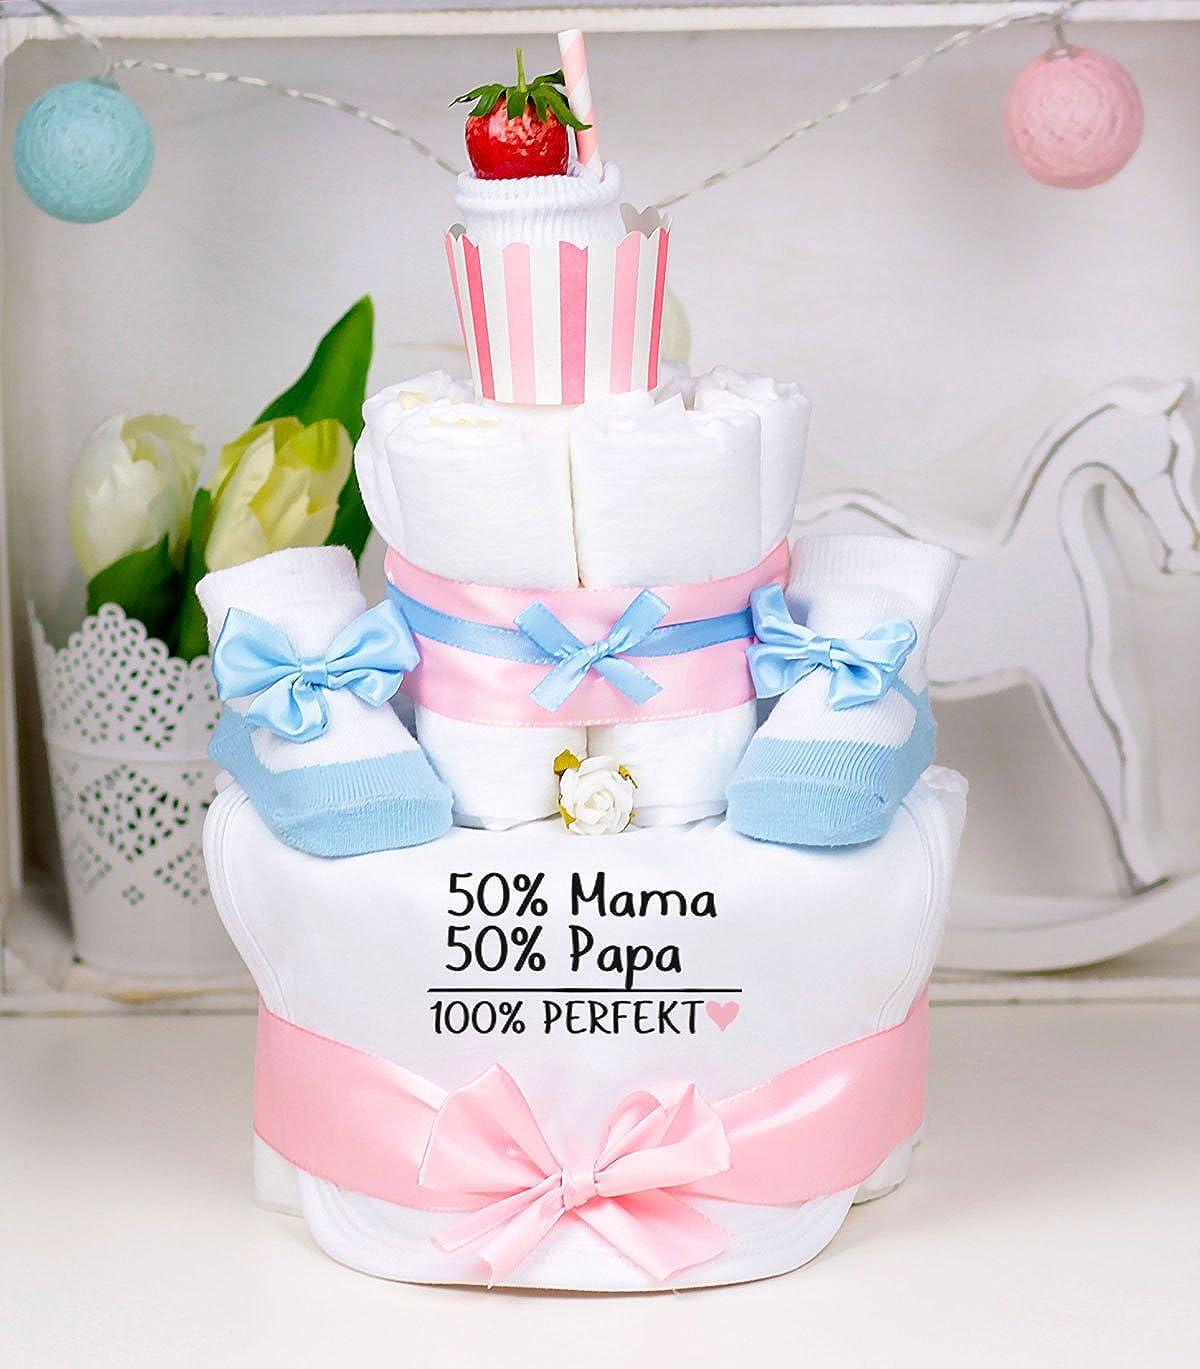 50/% Papa,100/% Perfekt Trend Mama Windeltorte Cupcake rosa-hellblau M/ädchen L/ätzchen Babysocken 50/% Mama